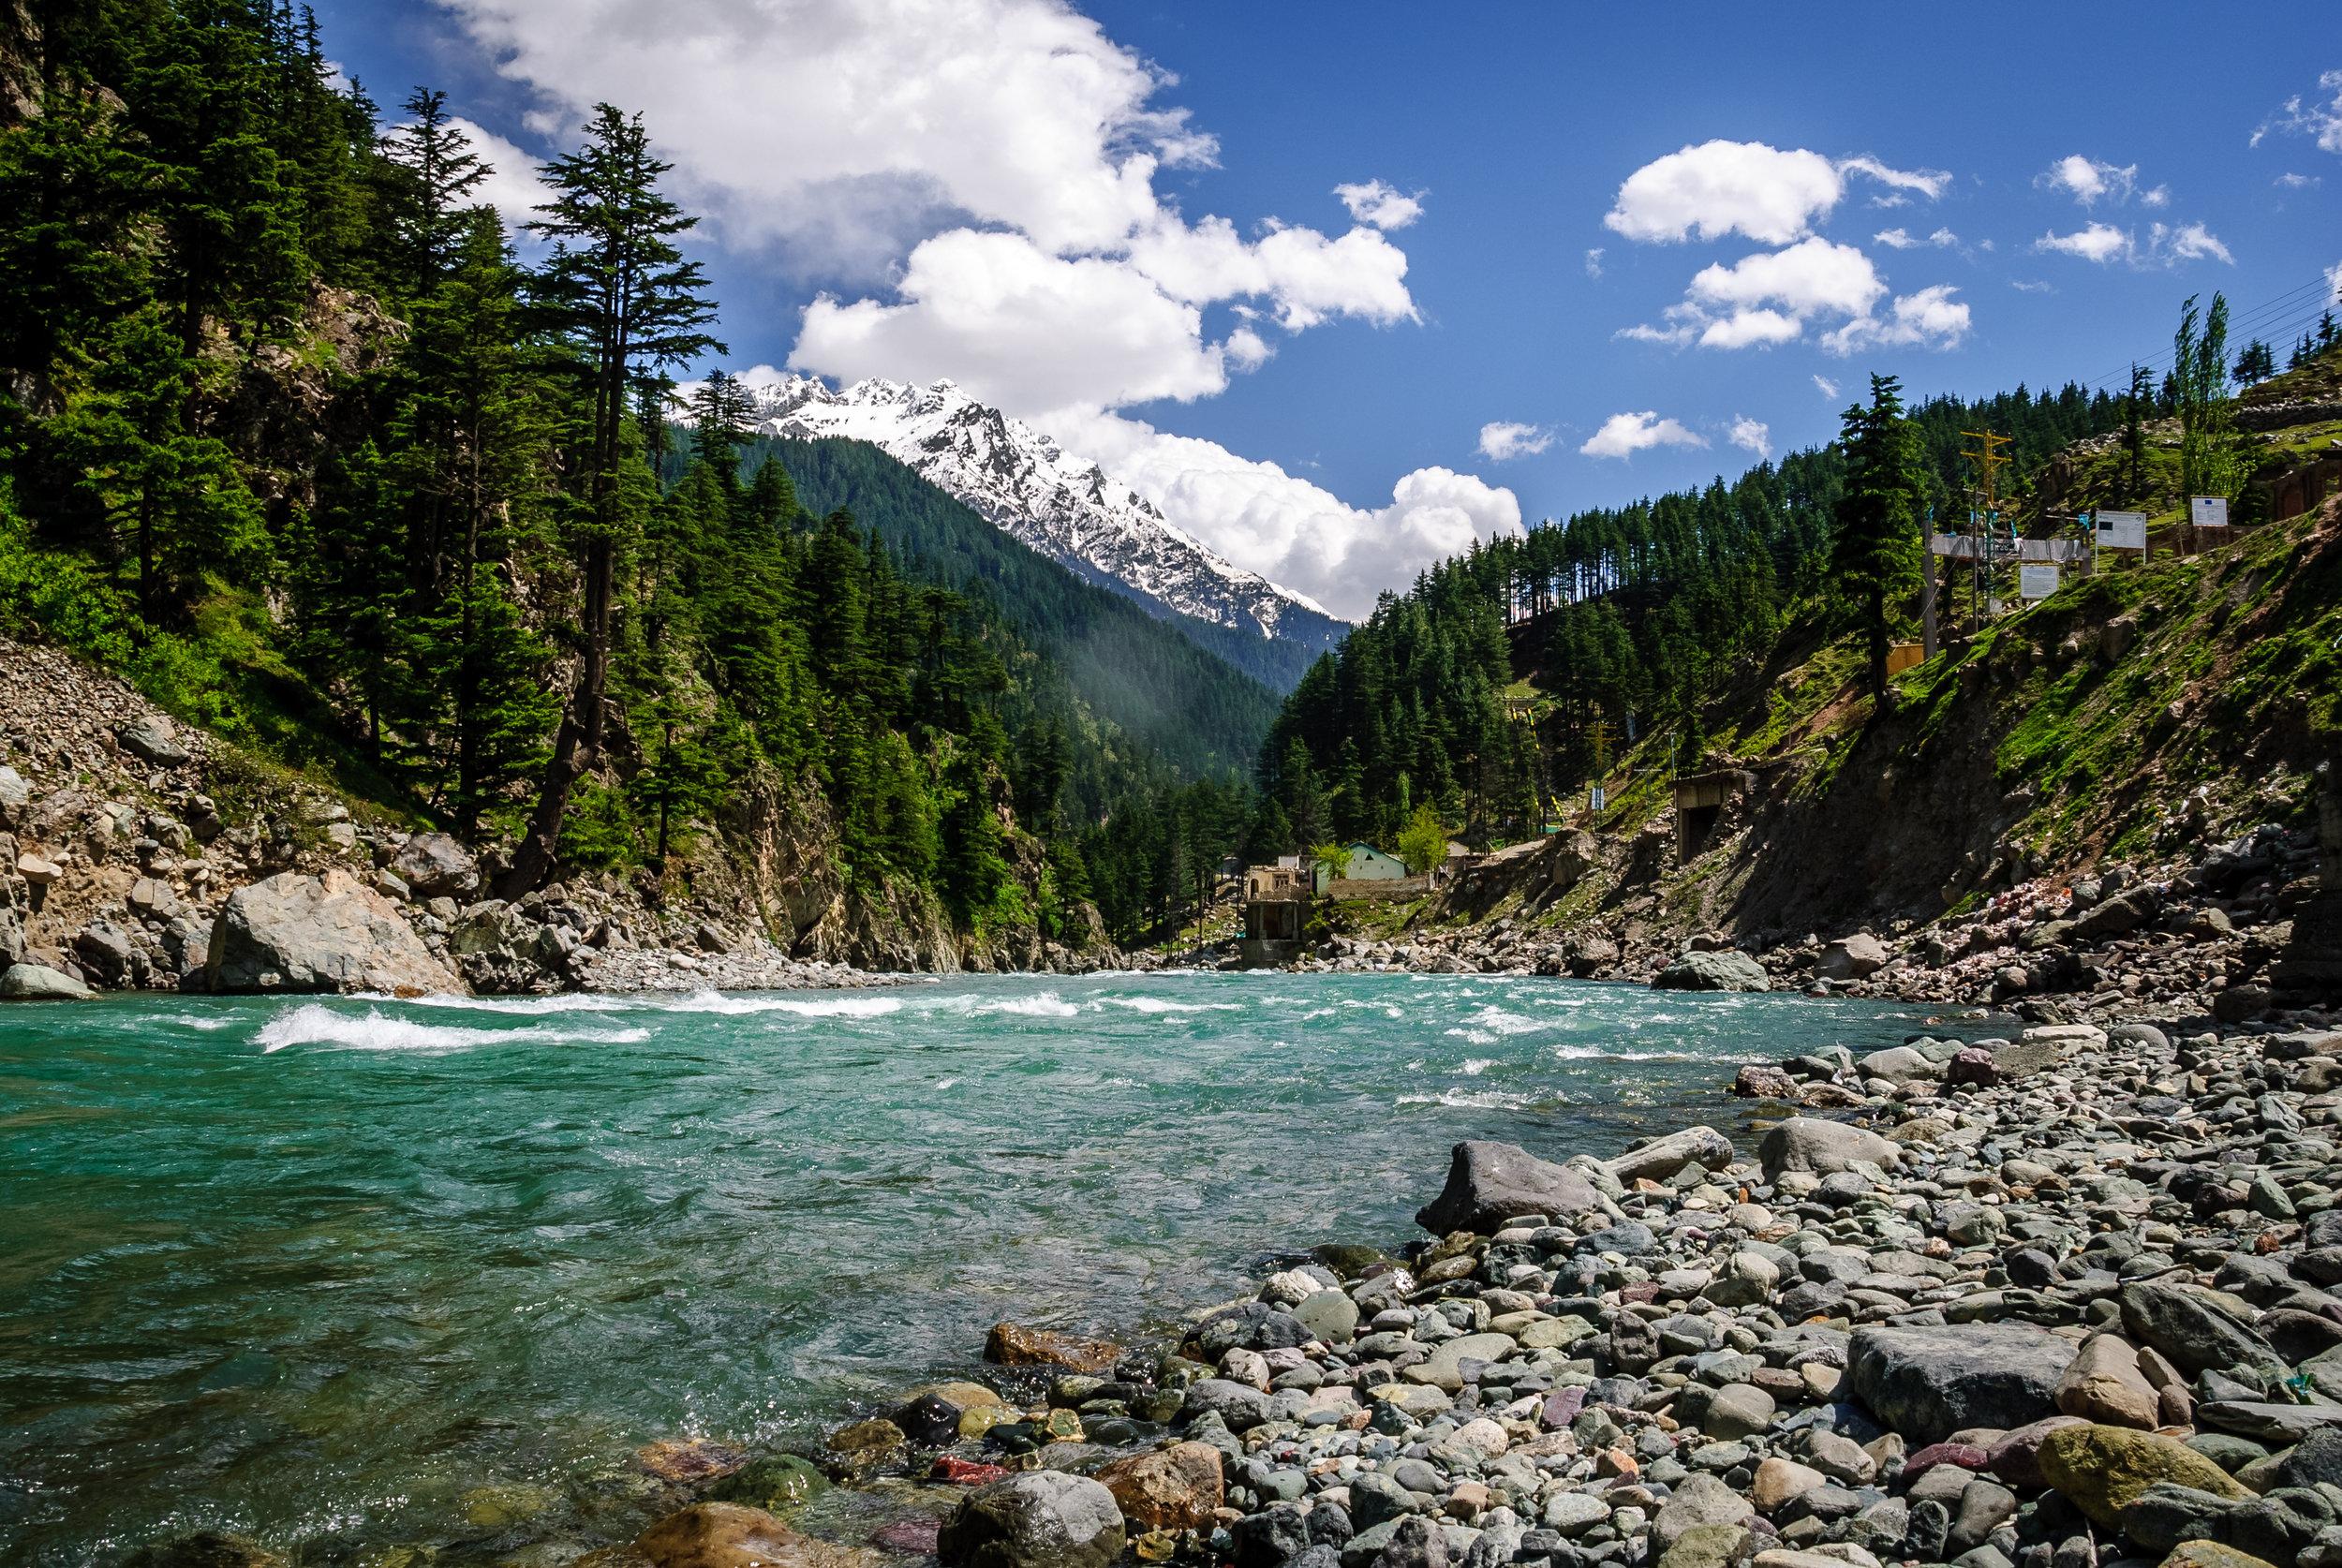 Photo 81 - River Swat.jpg